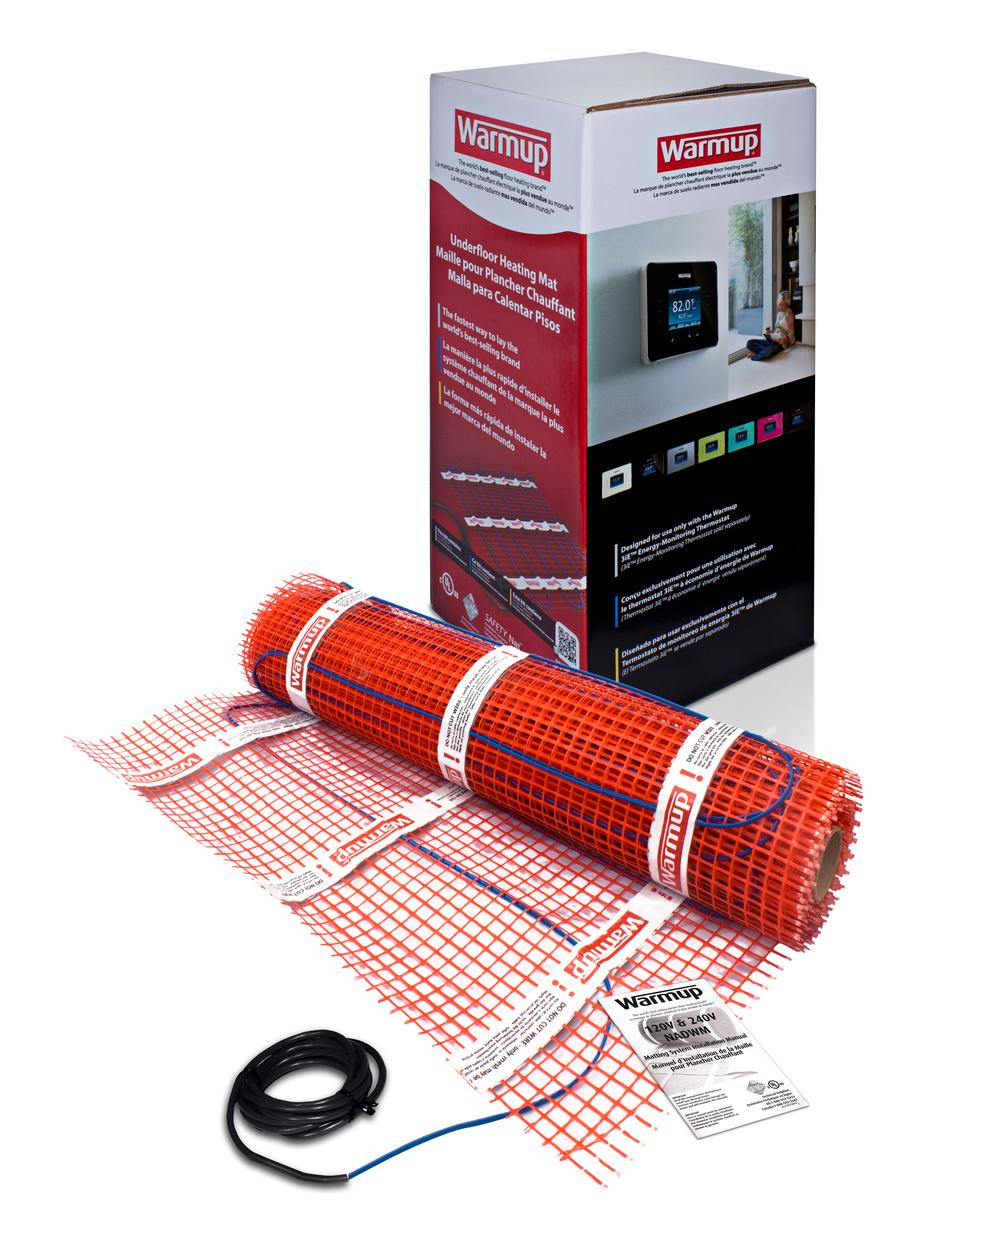 Underfloor-Mat-+-Box-+-Manual-+-Wire.jpg